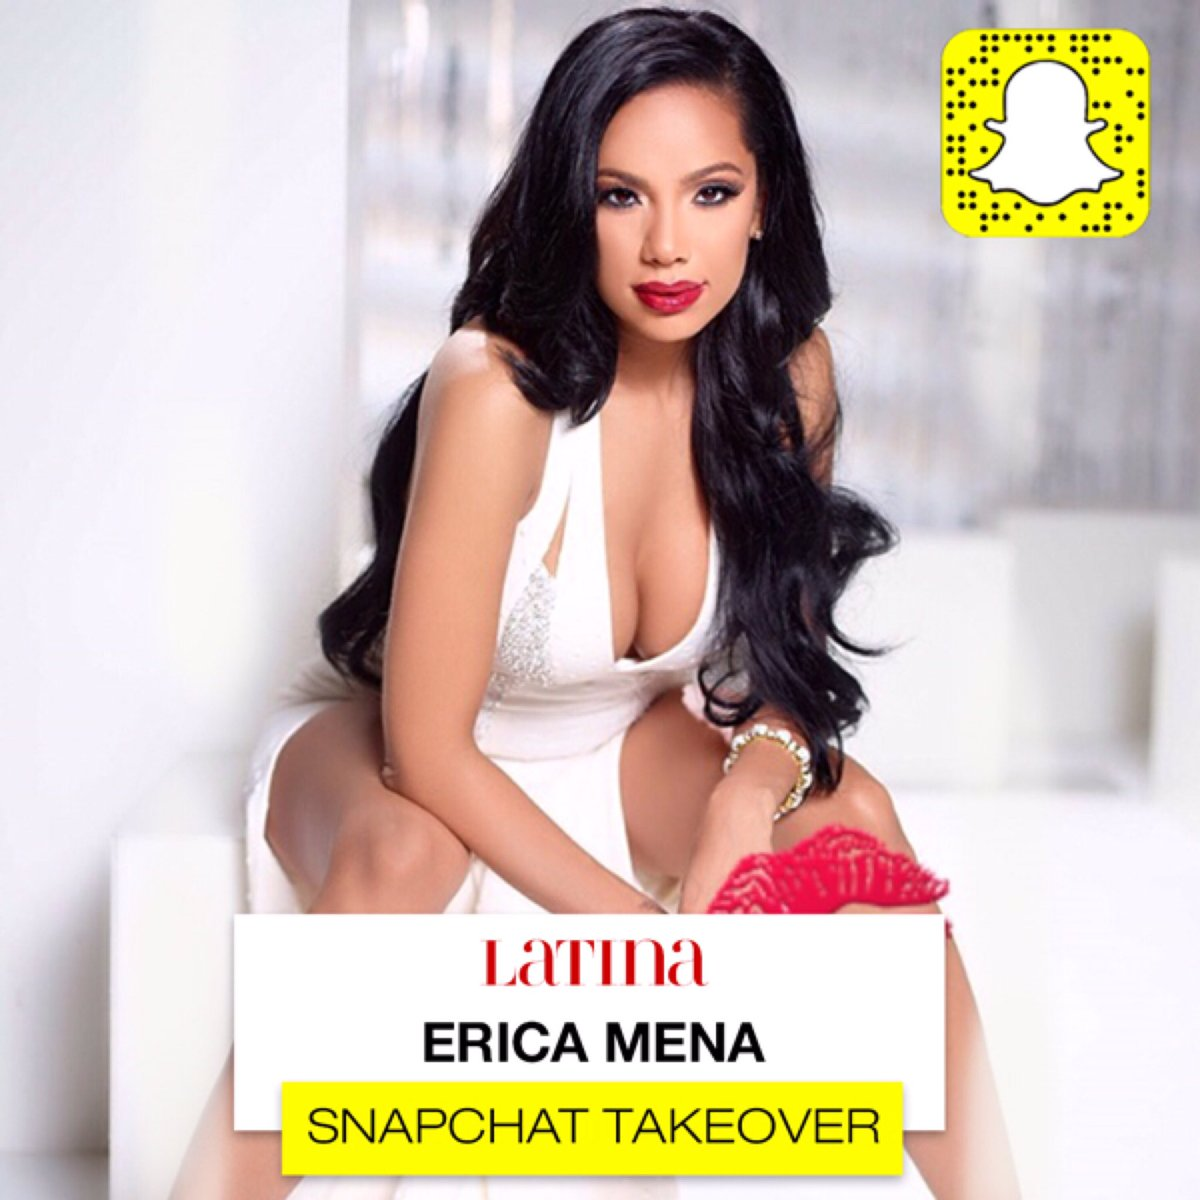 Snapchat Erica Mena nude photos 2019